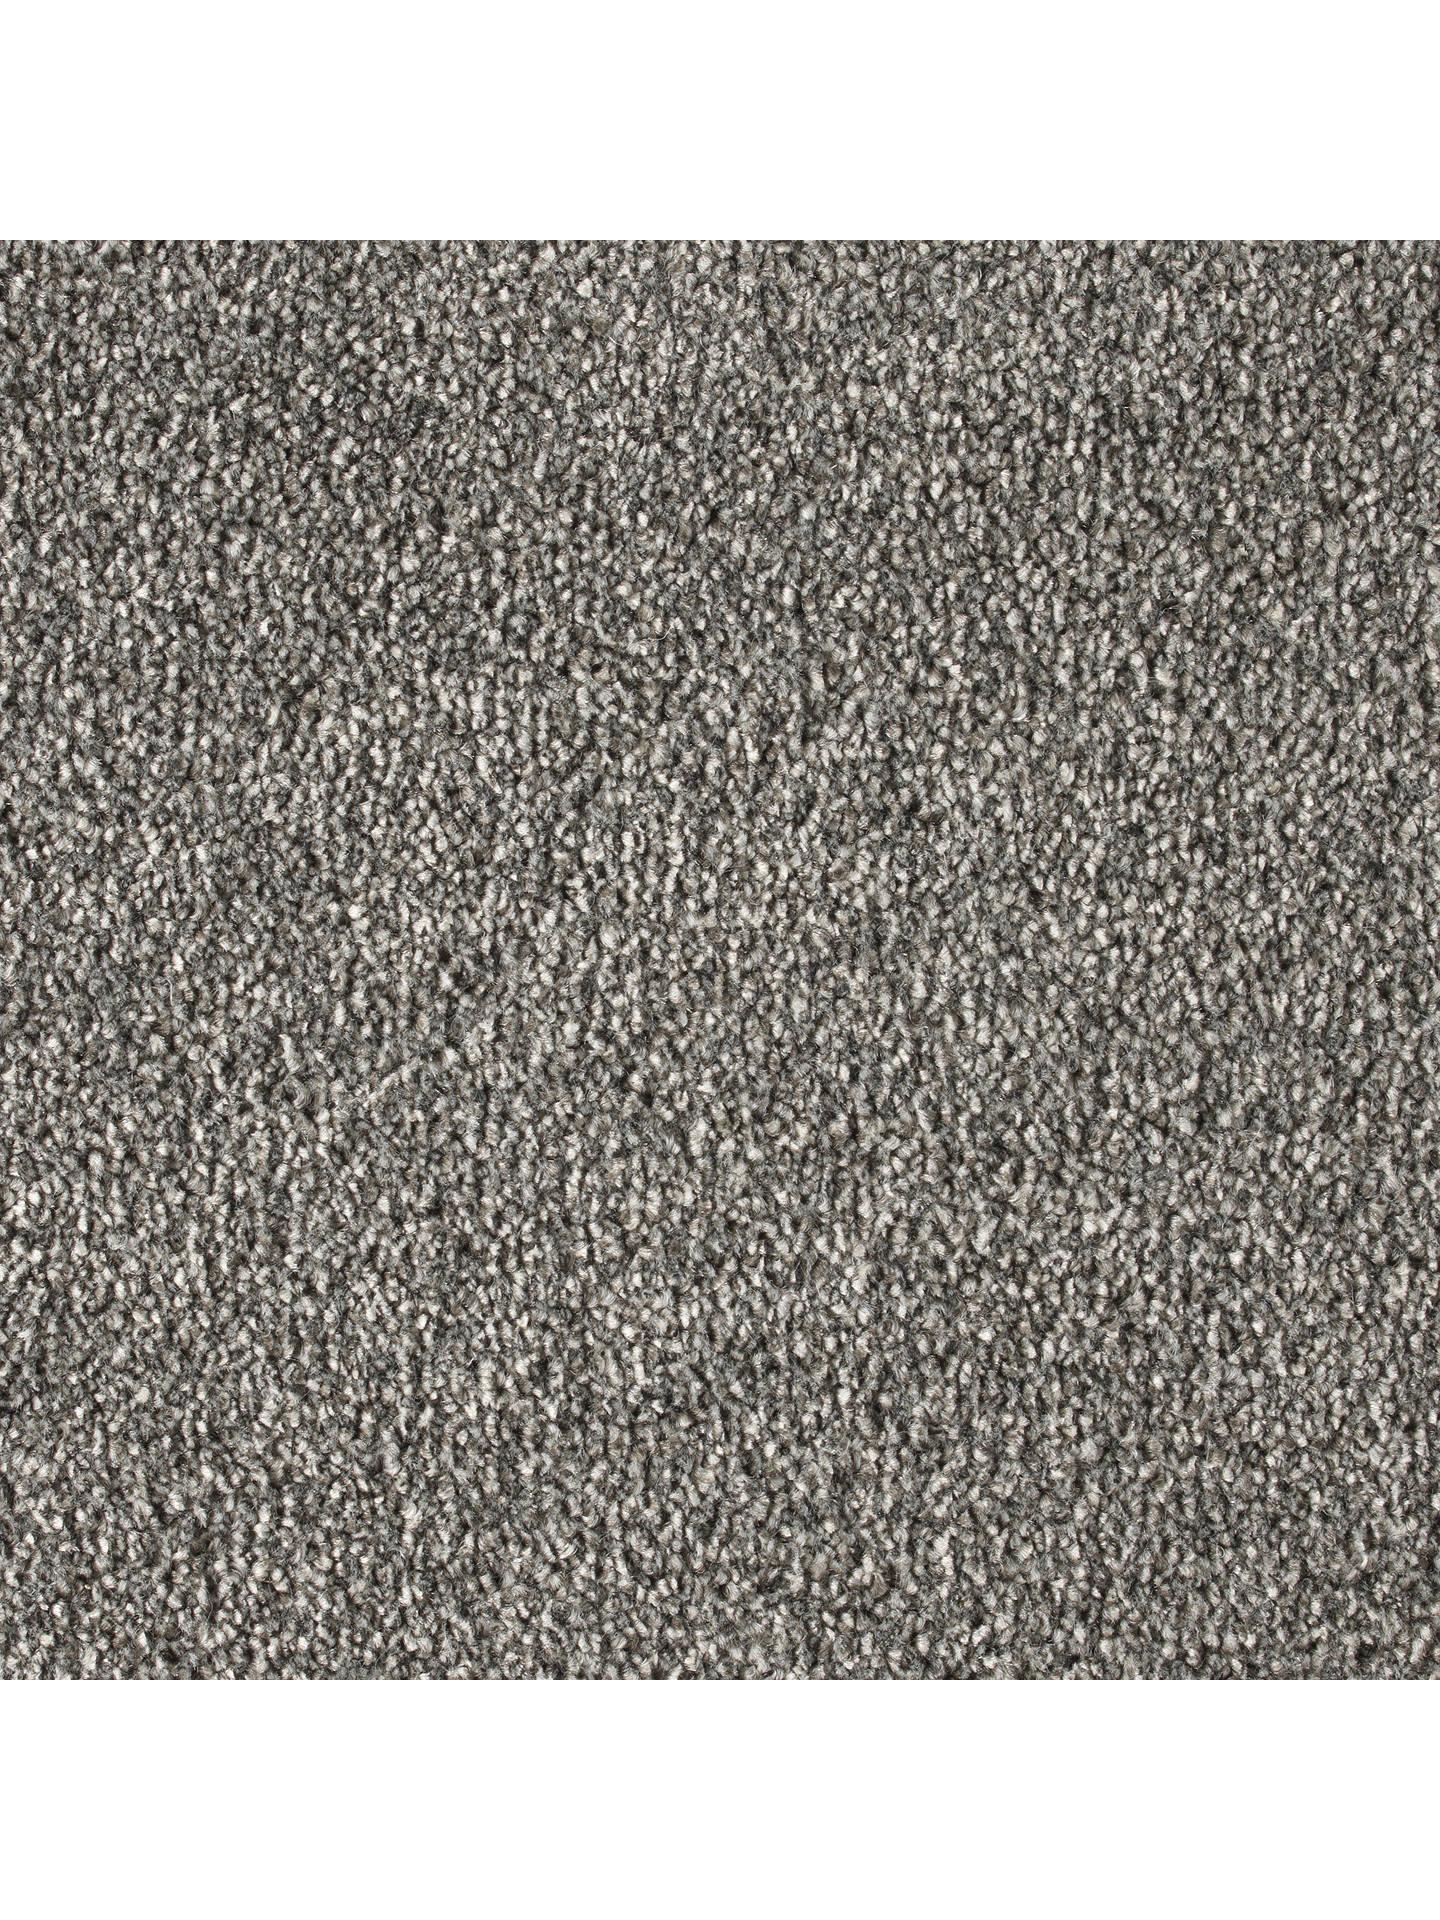 john lewis partners metro twist carpet at john lewis. Black Bedroom Furniture Sets. Home Design Ideas